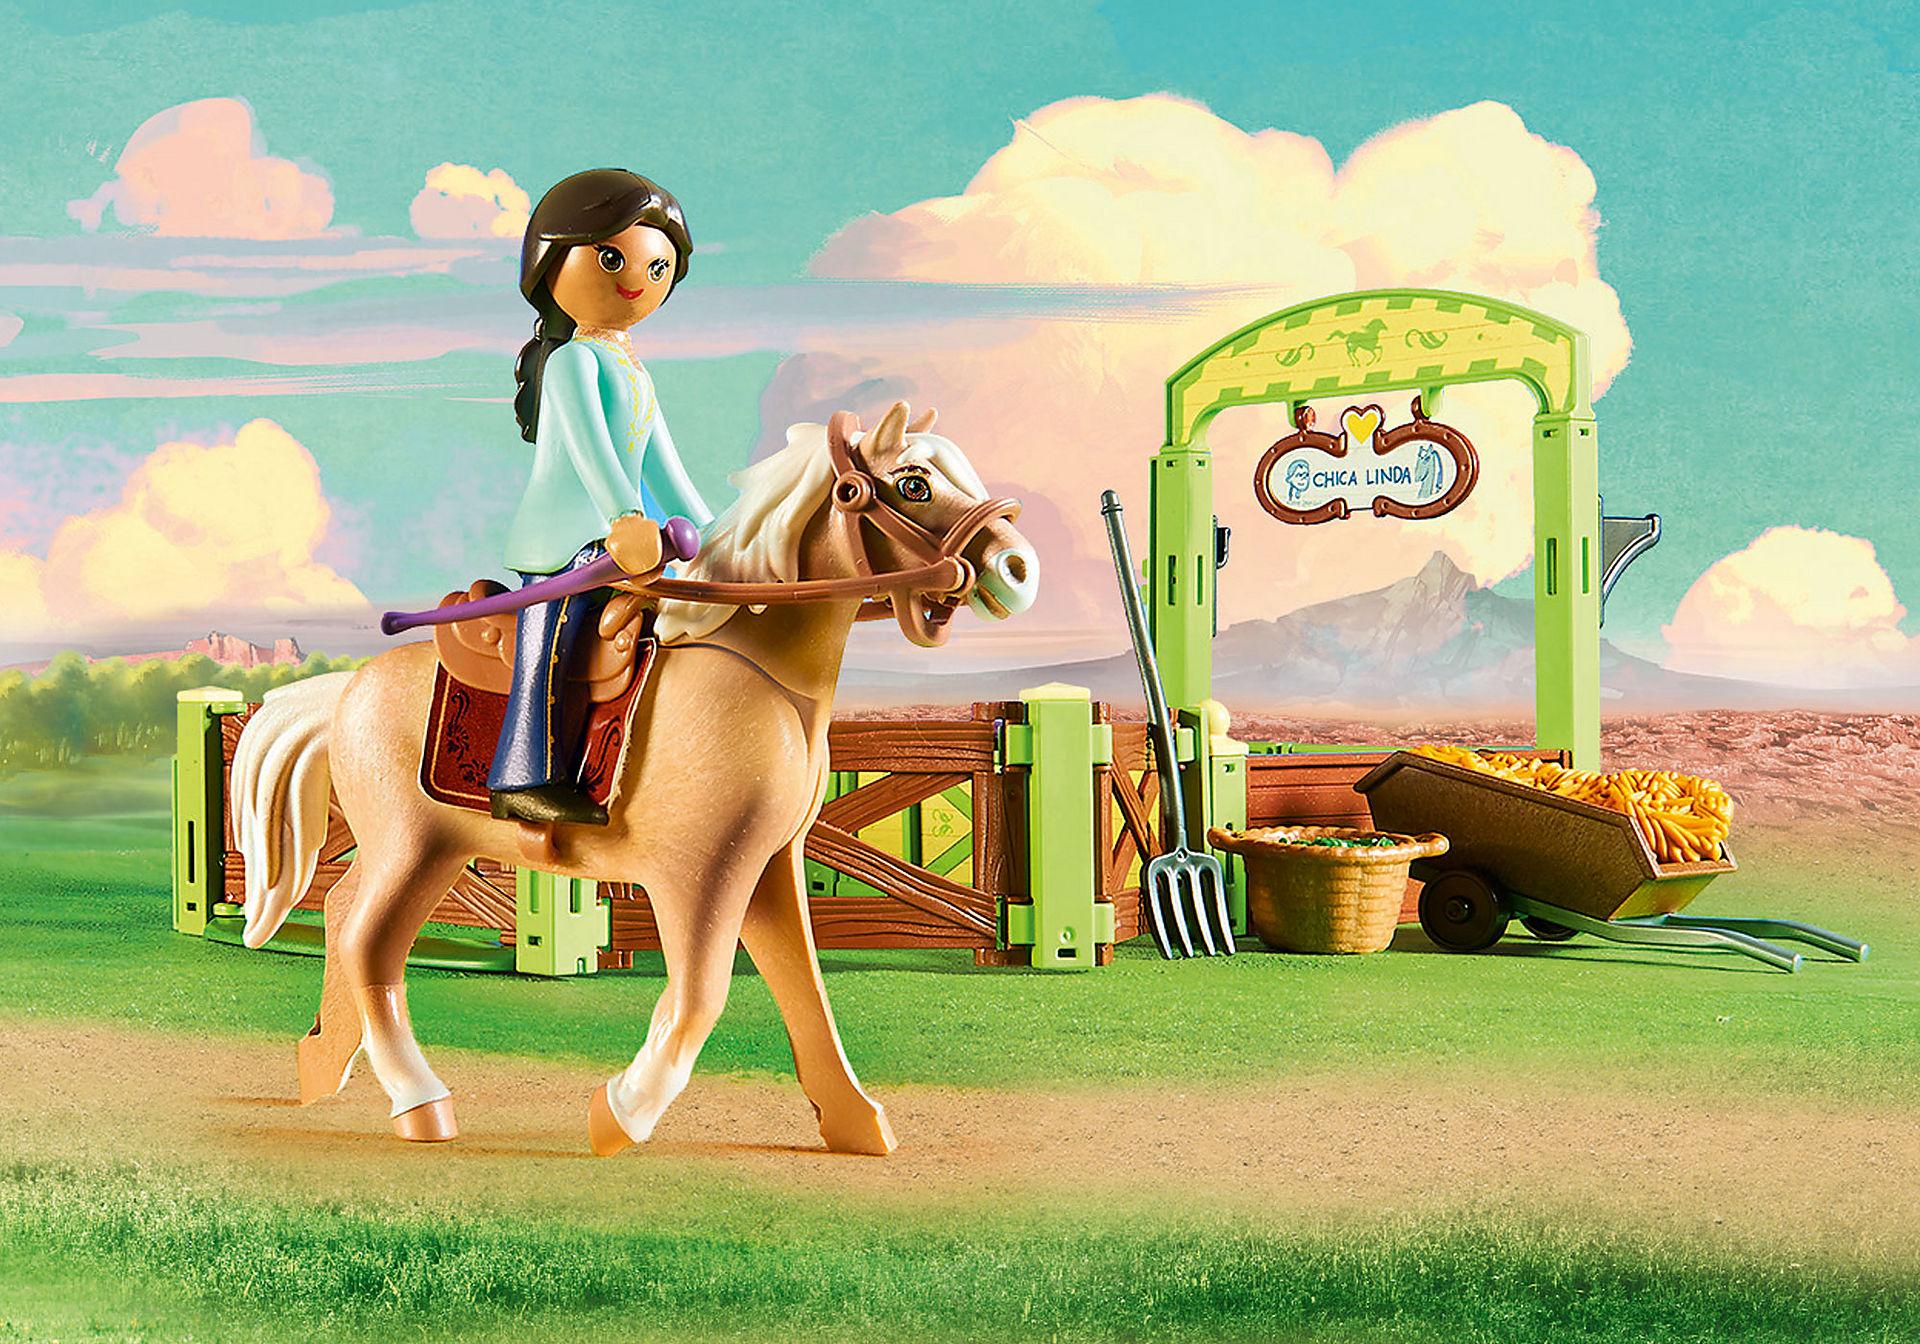 http://media.playmobil.com/i/playmobil/9479_product_extra1/Pru & Chica Linda met paardenbox